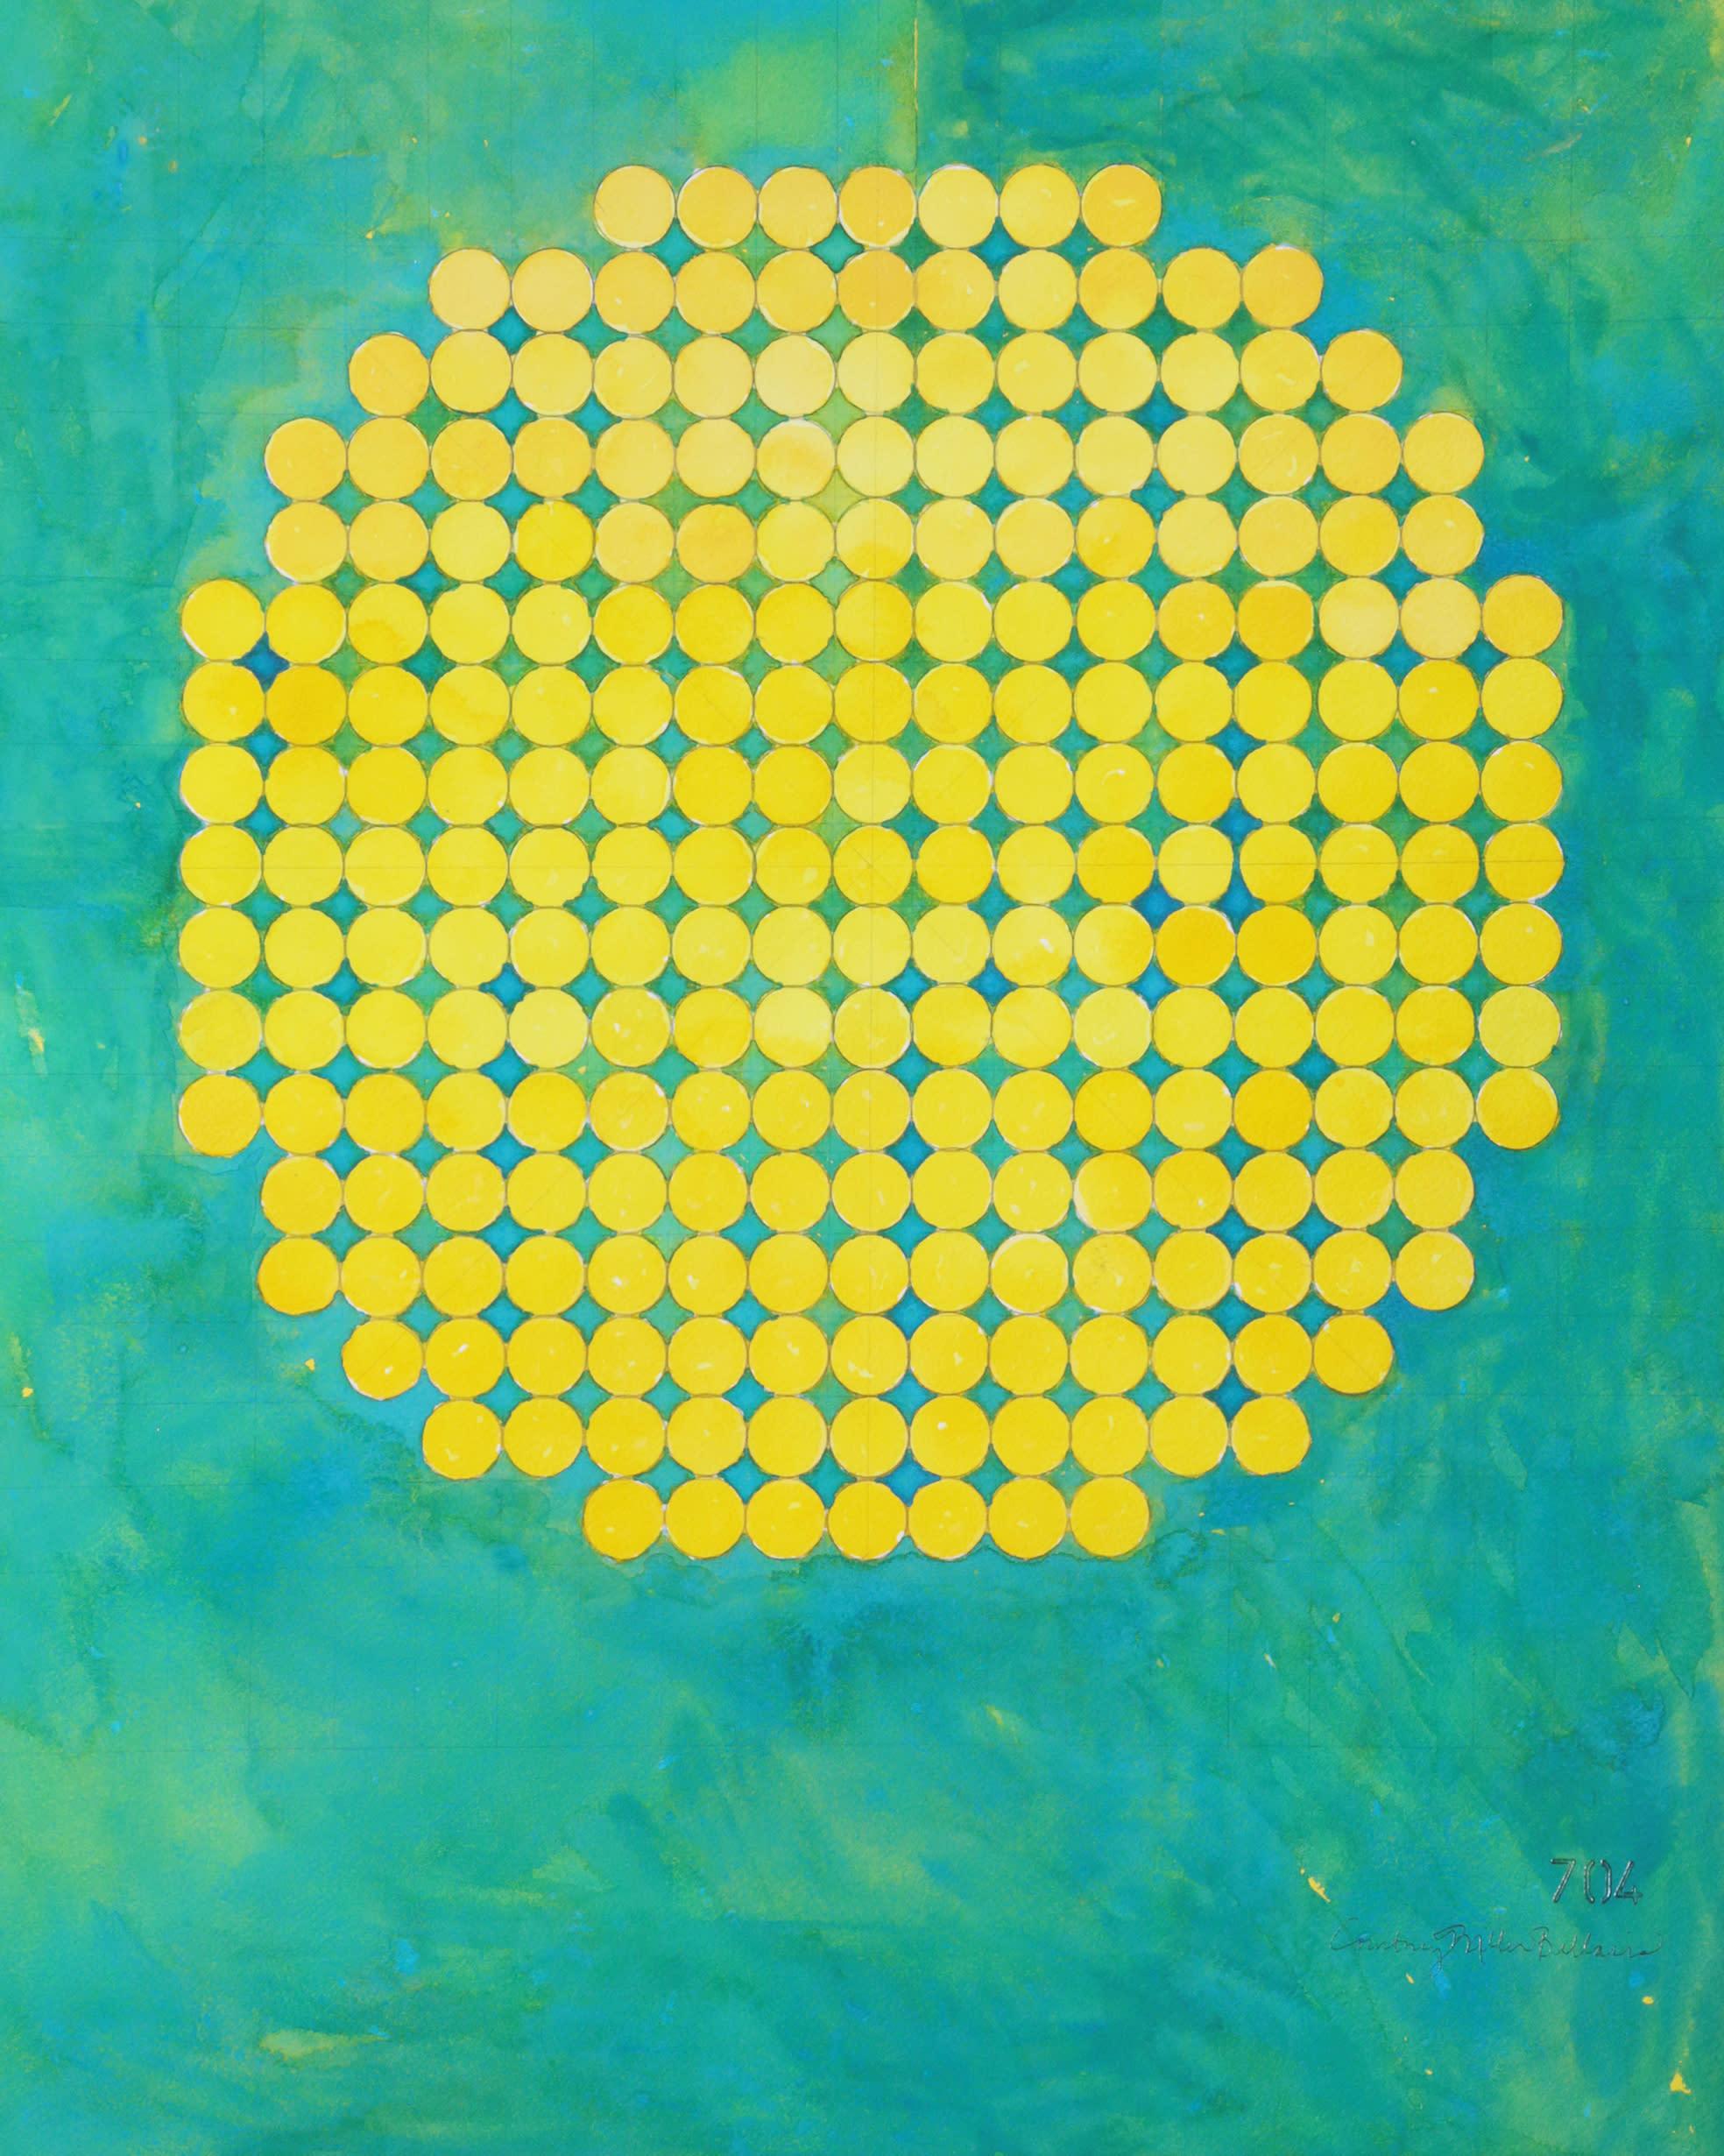 704 yellowonturquoiselarge2 lzjnff